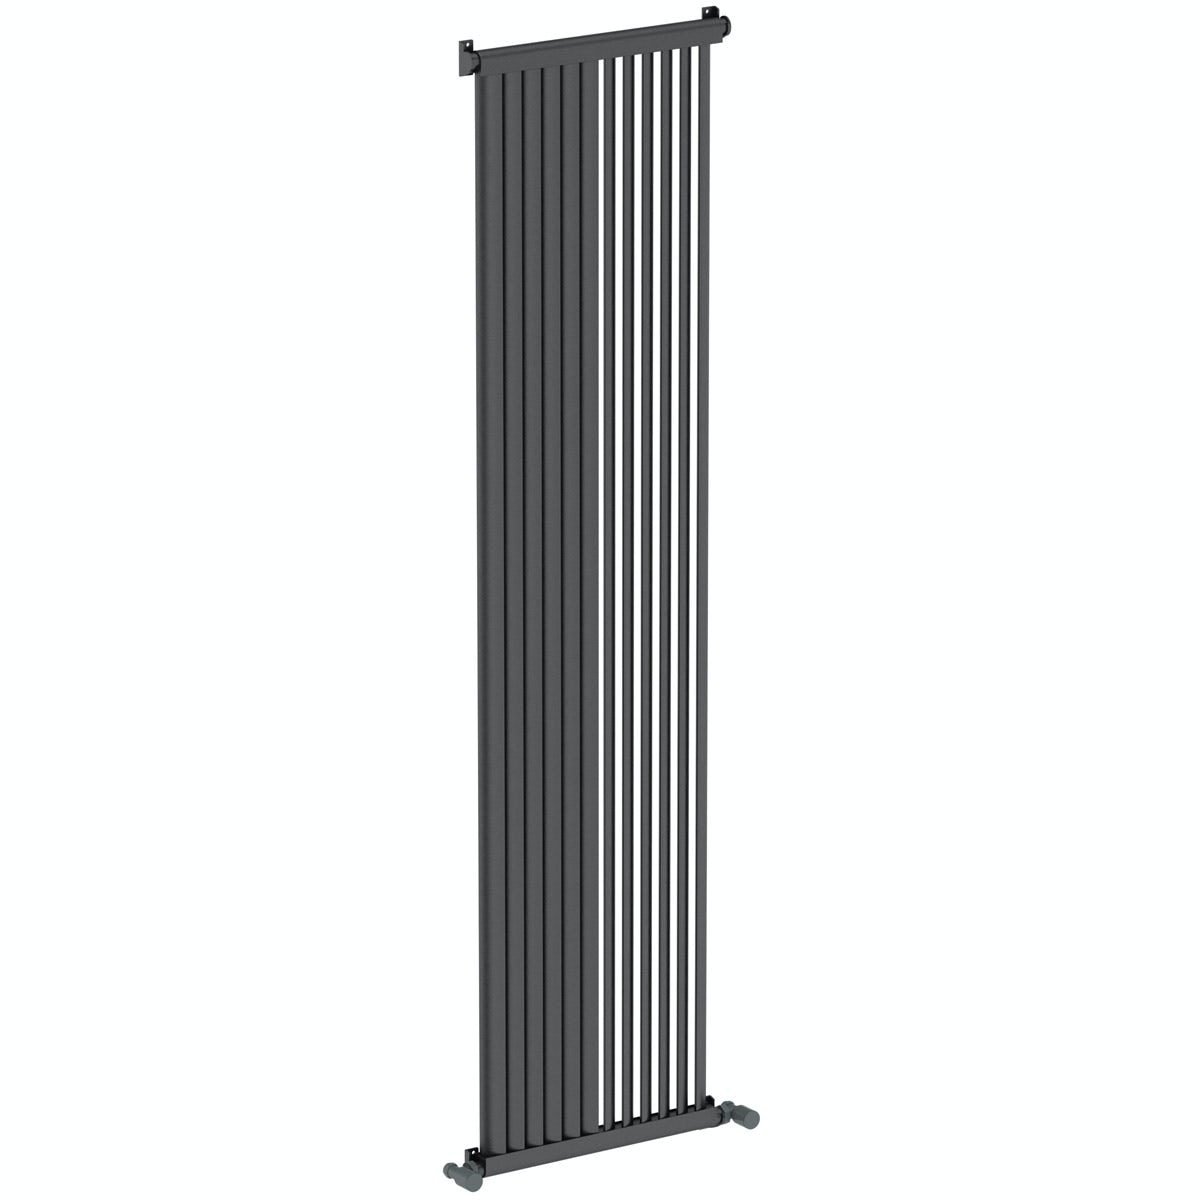 Mode Zephyra anthracite vertical radiator 1800 x 468